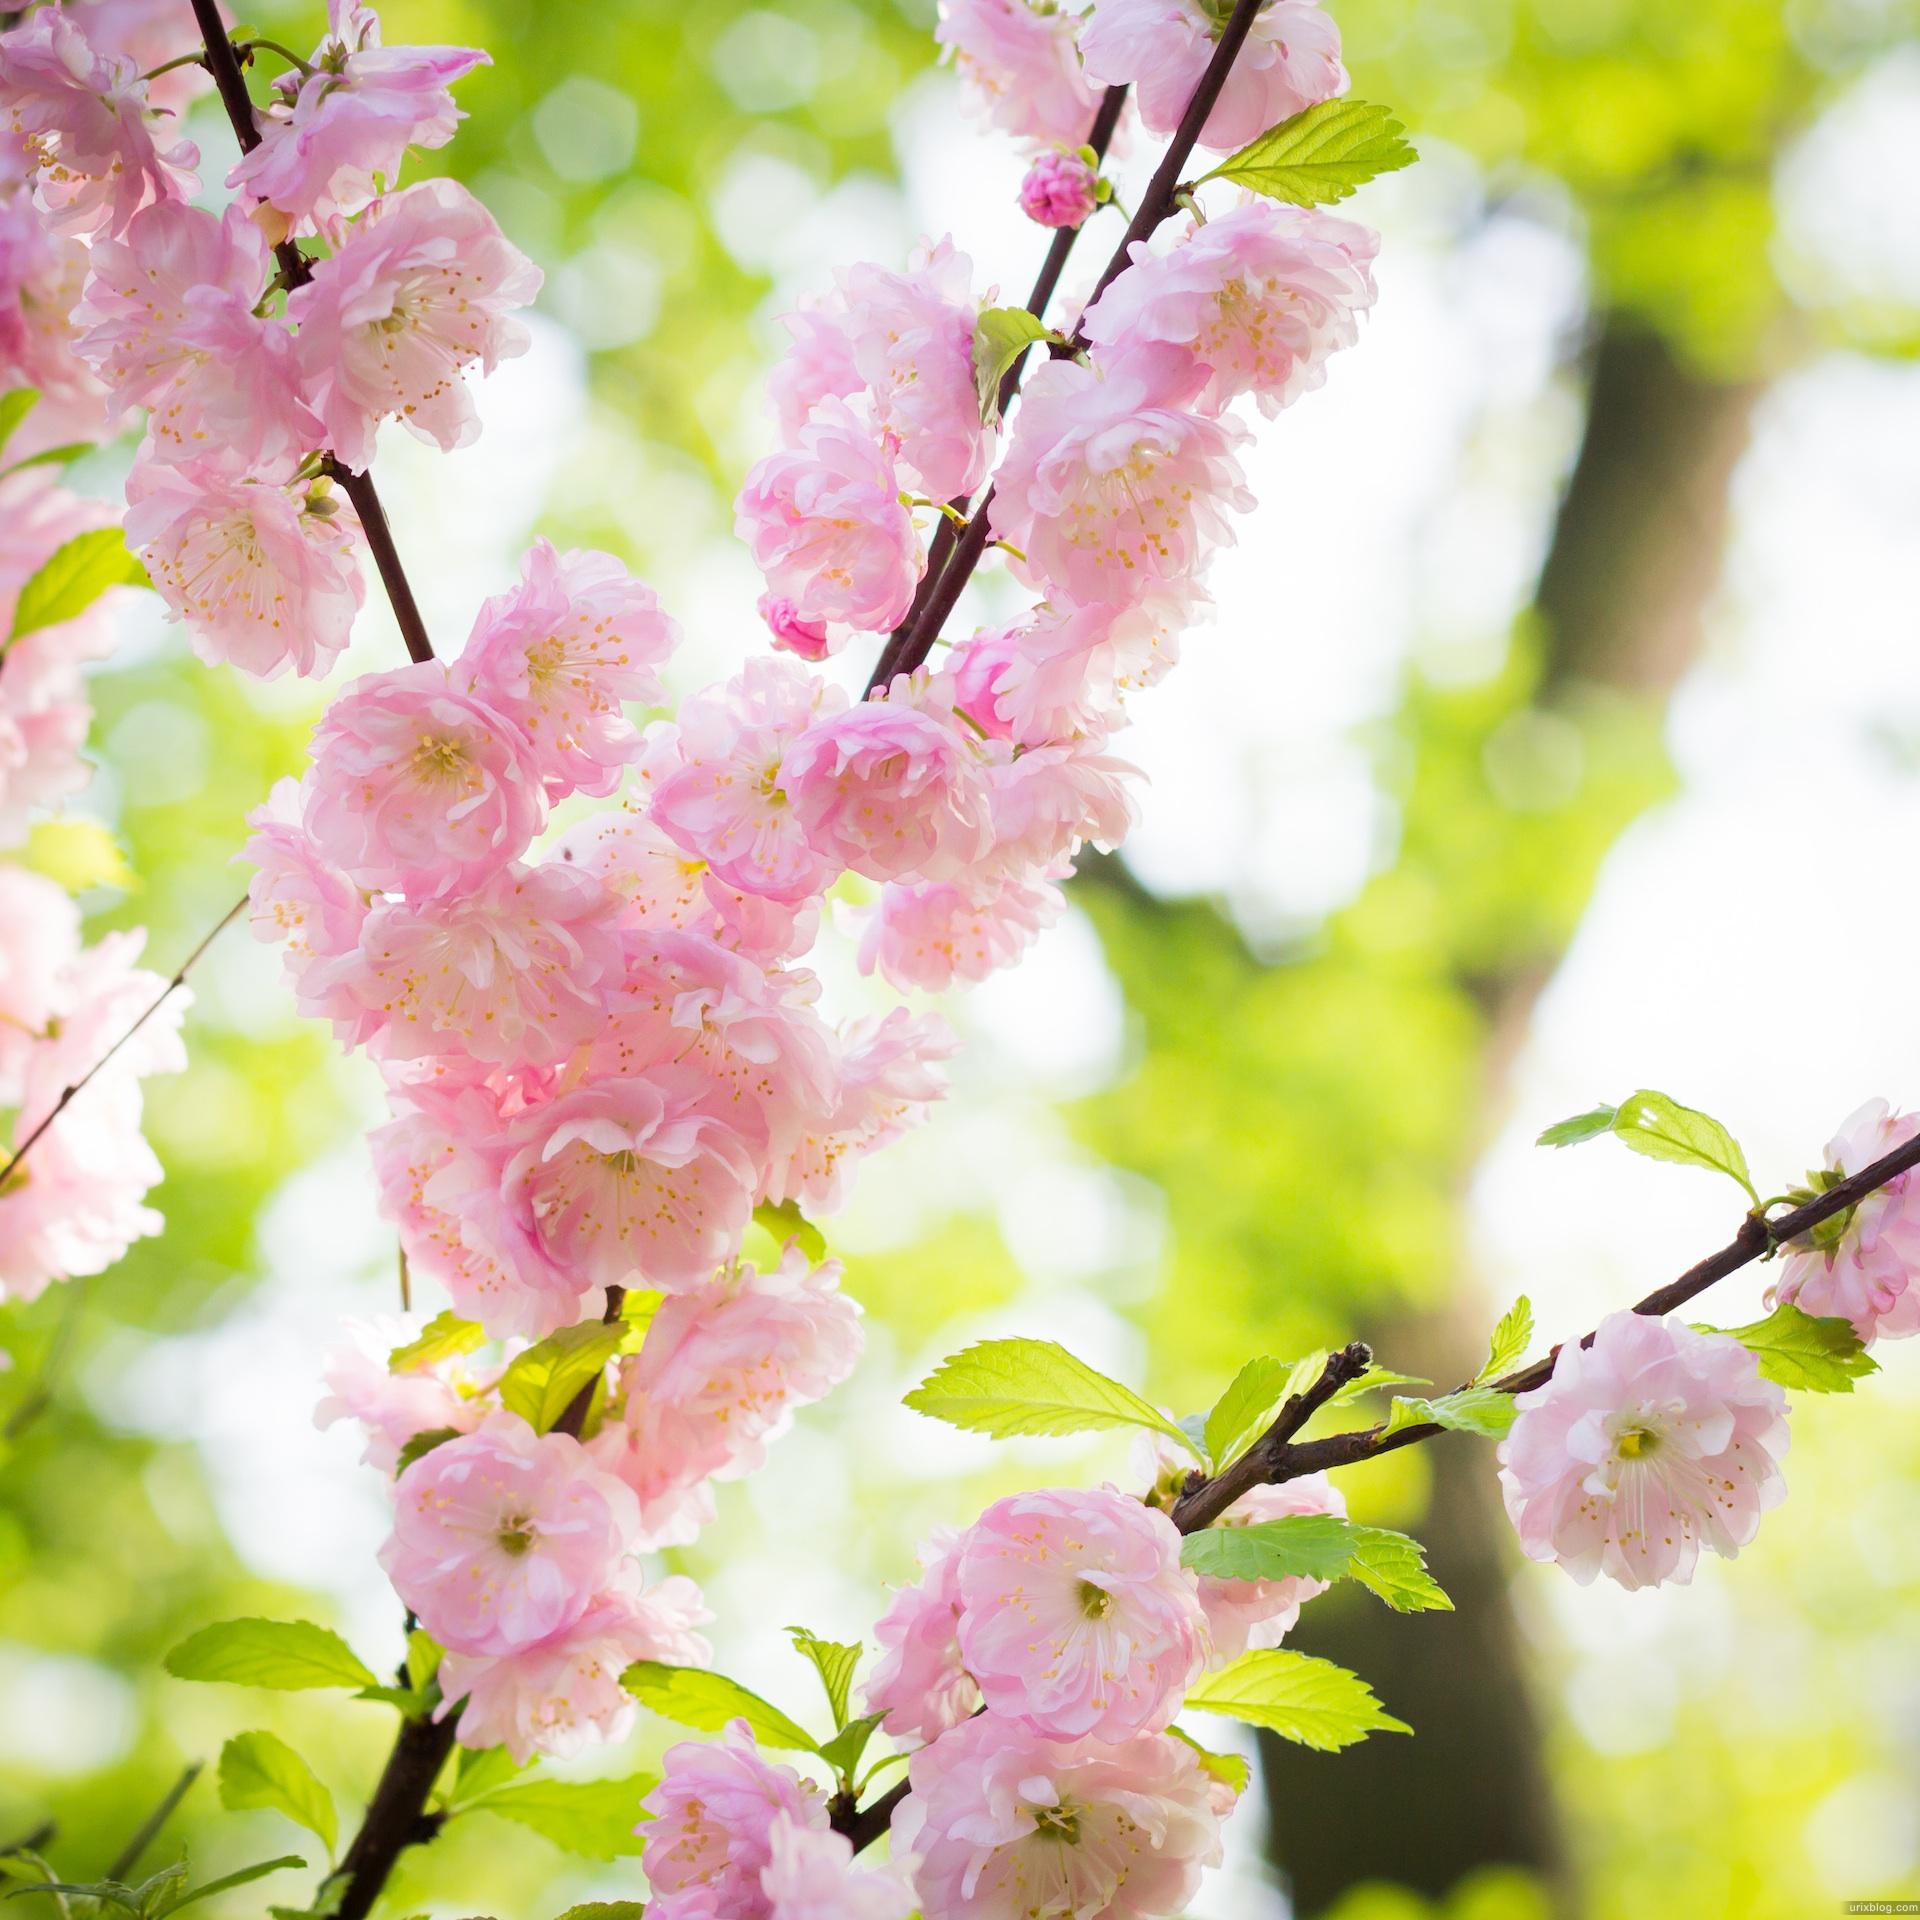 Юкен ютьюб огород и сад цветы